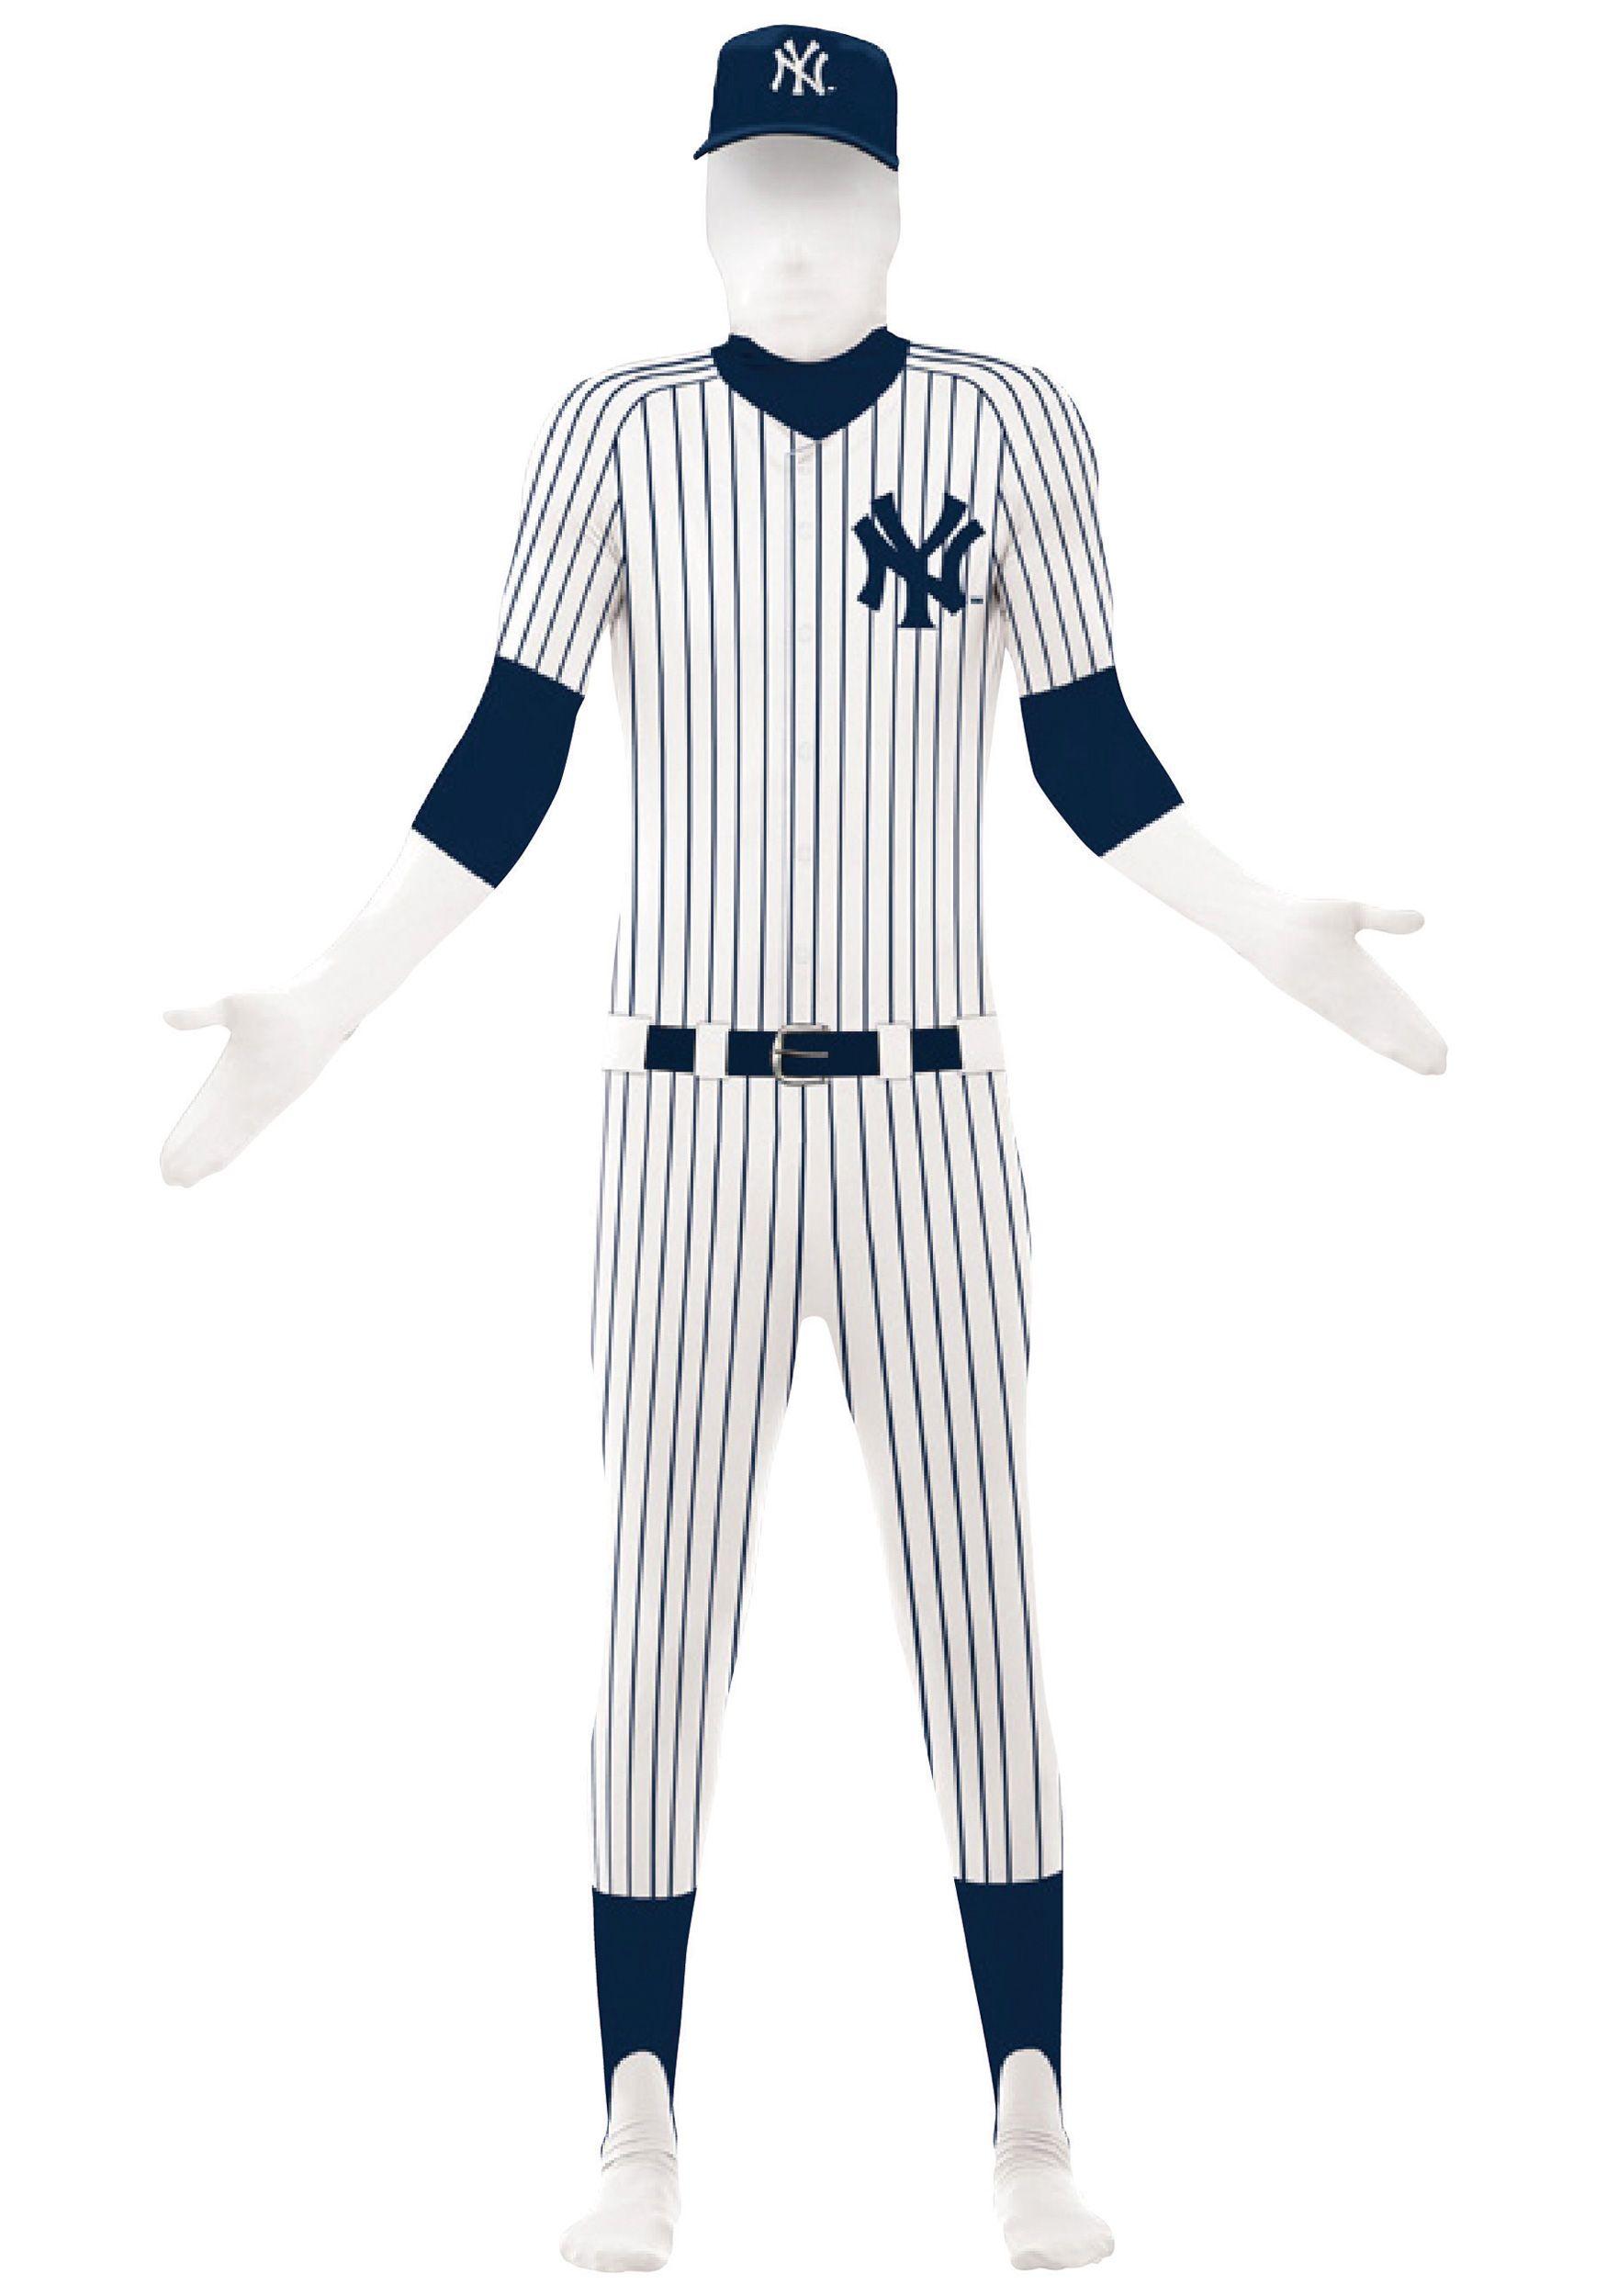 promo code e79c1 e3a96 Mens New York Yankees Costume | NYE - Iconic New York ...